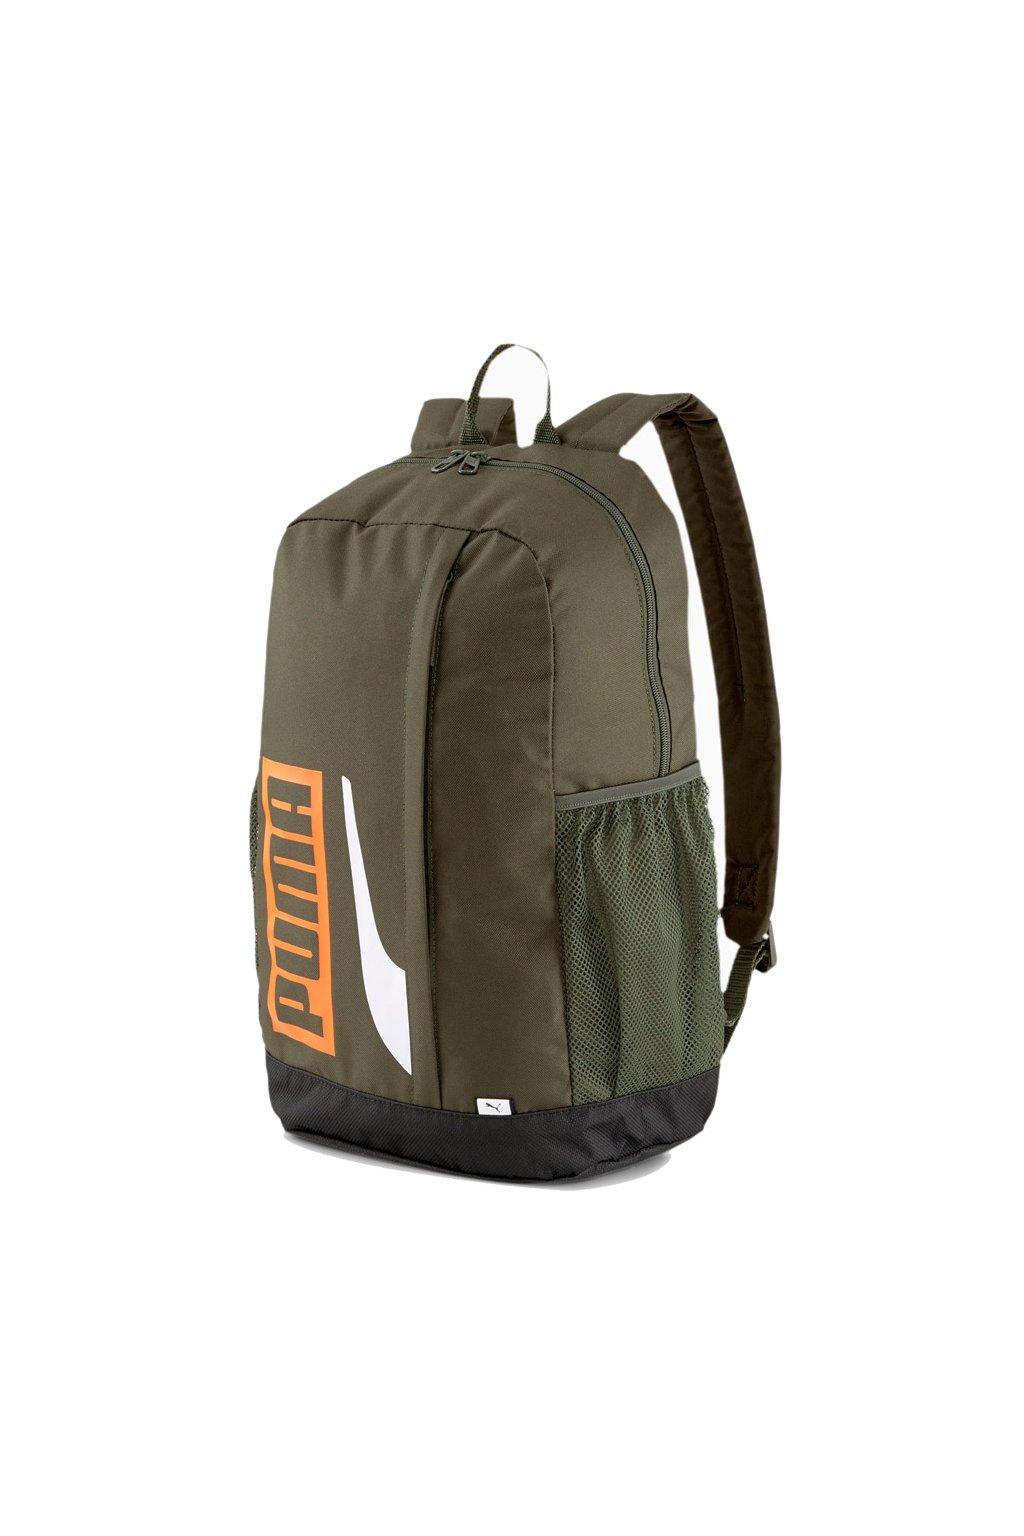 Batoh Puma Plus II zelený 075749 16